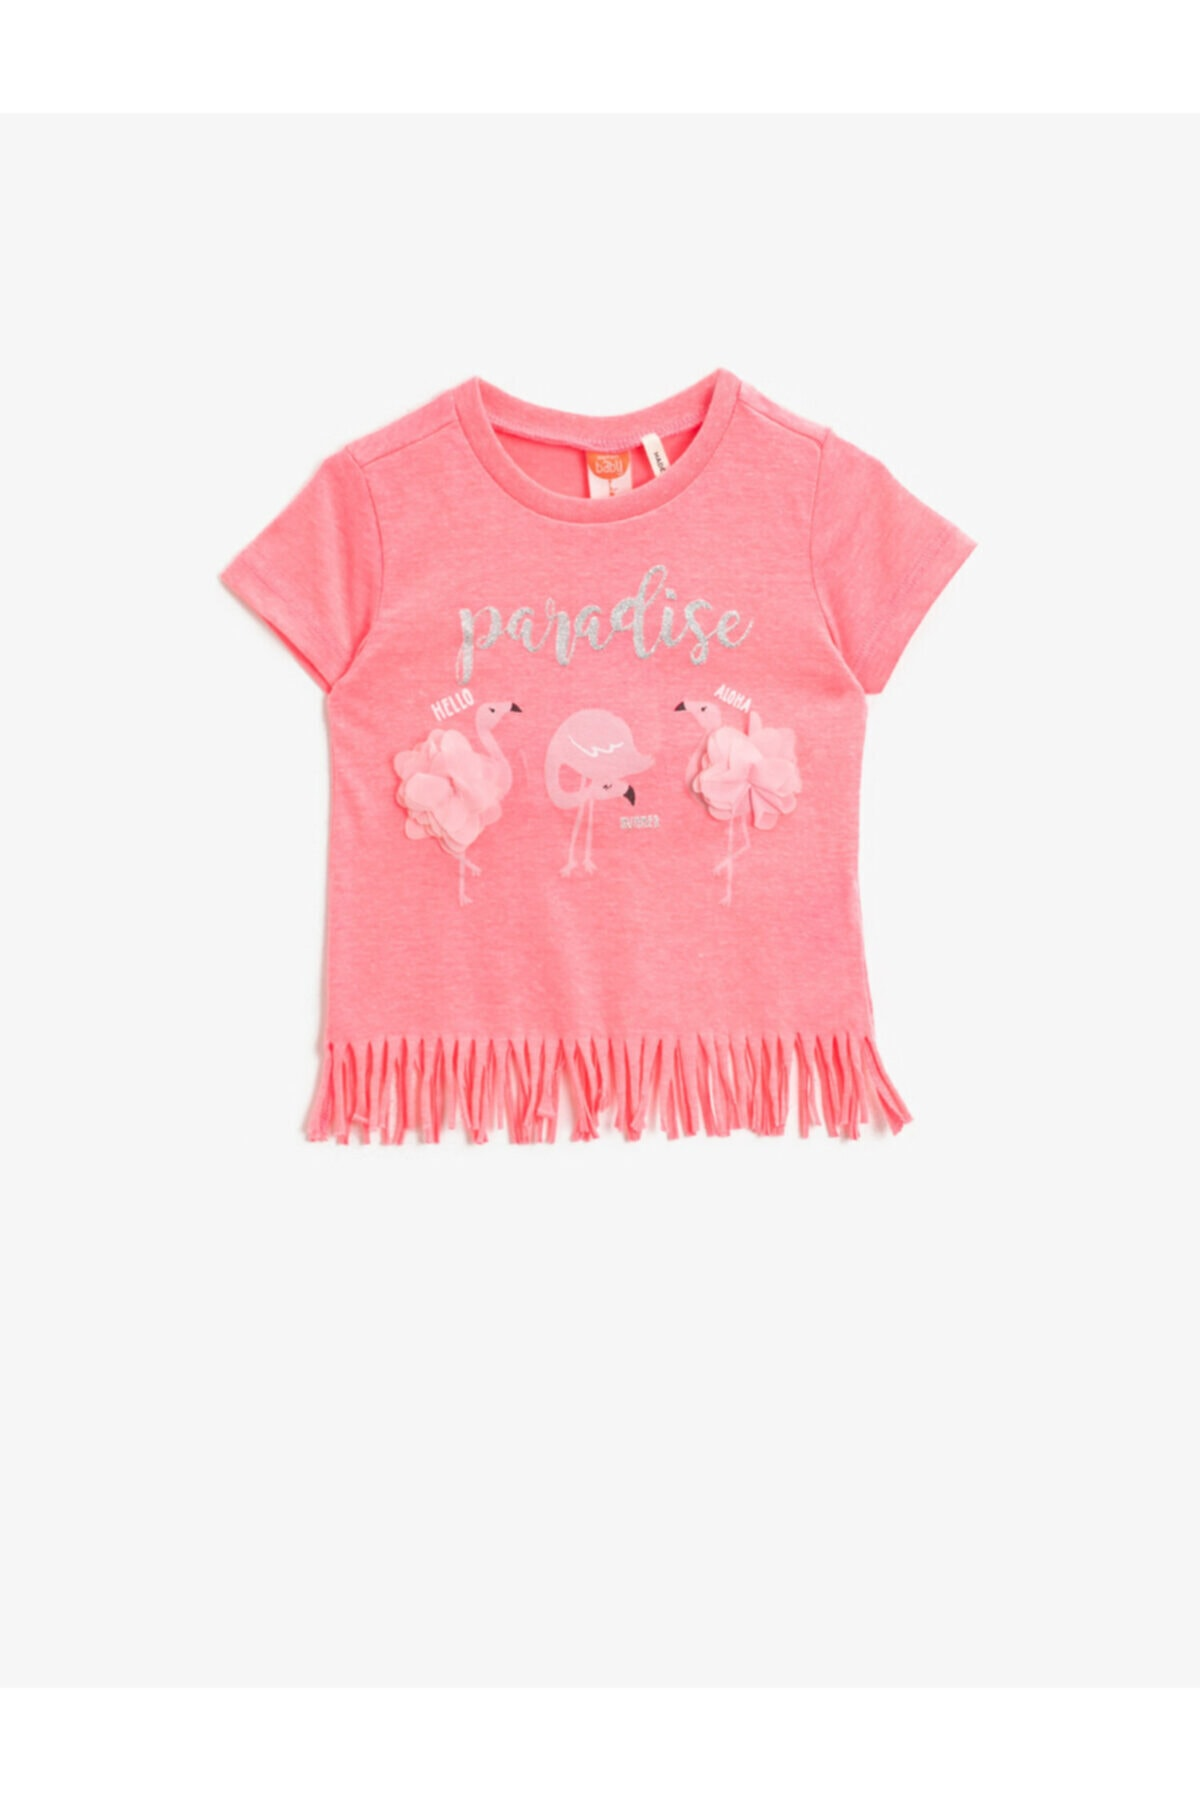 تیشرت نوزاد دخترانه خفن برند کوتون رنگ صورتی ty93139027